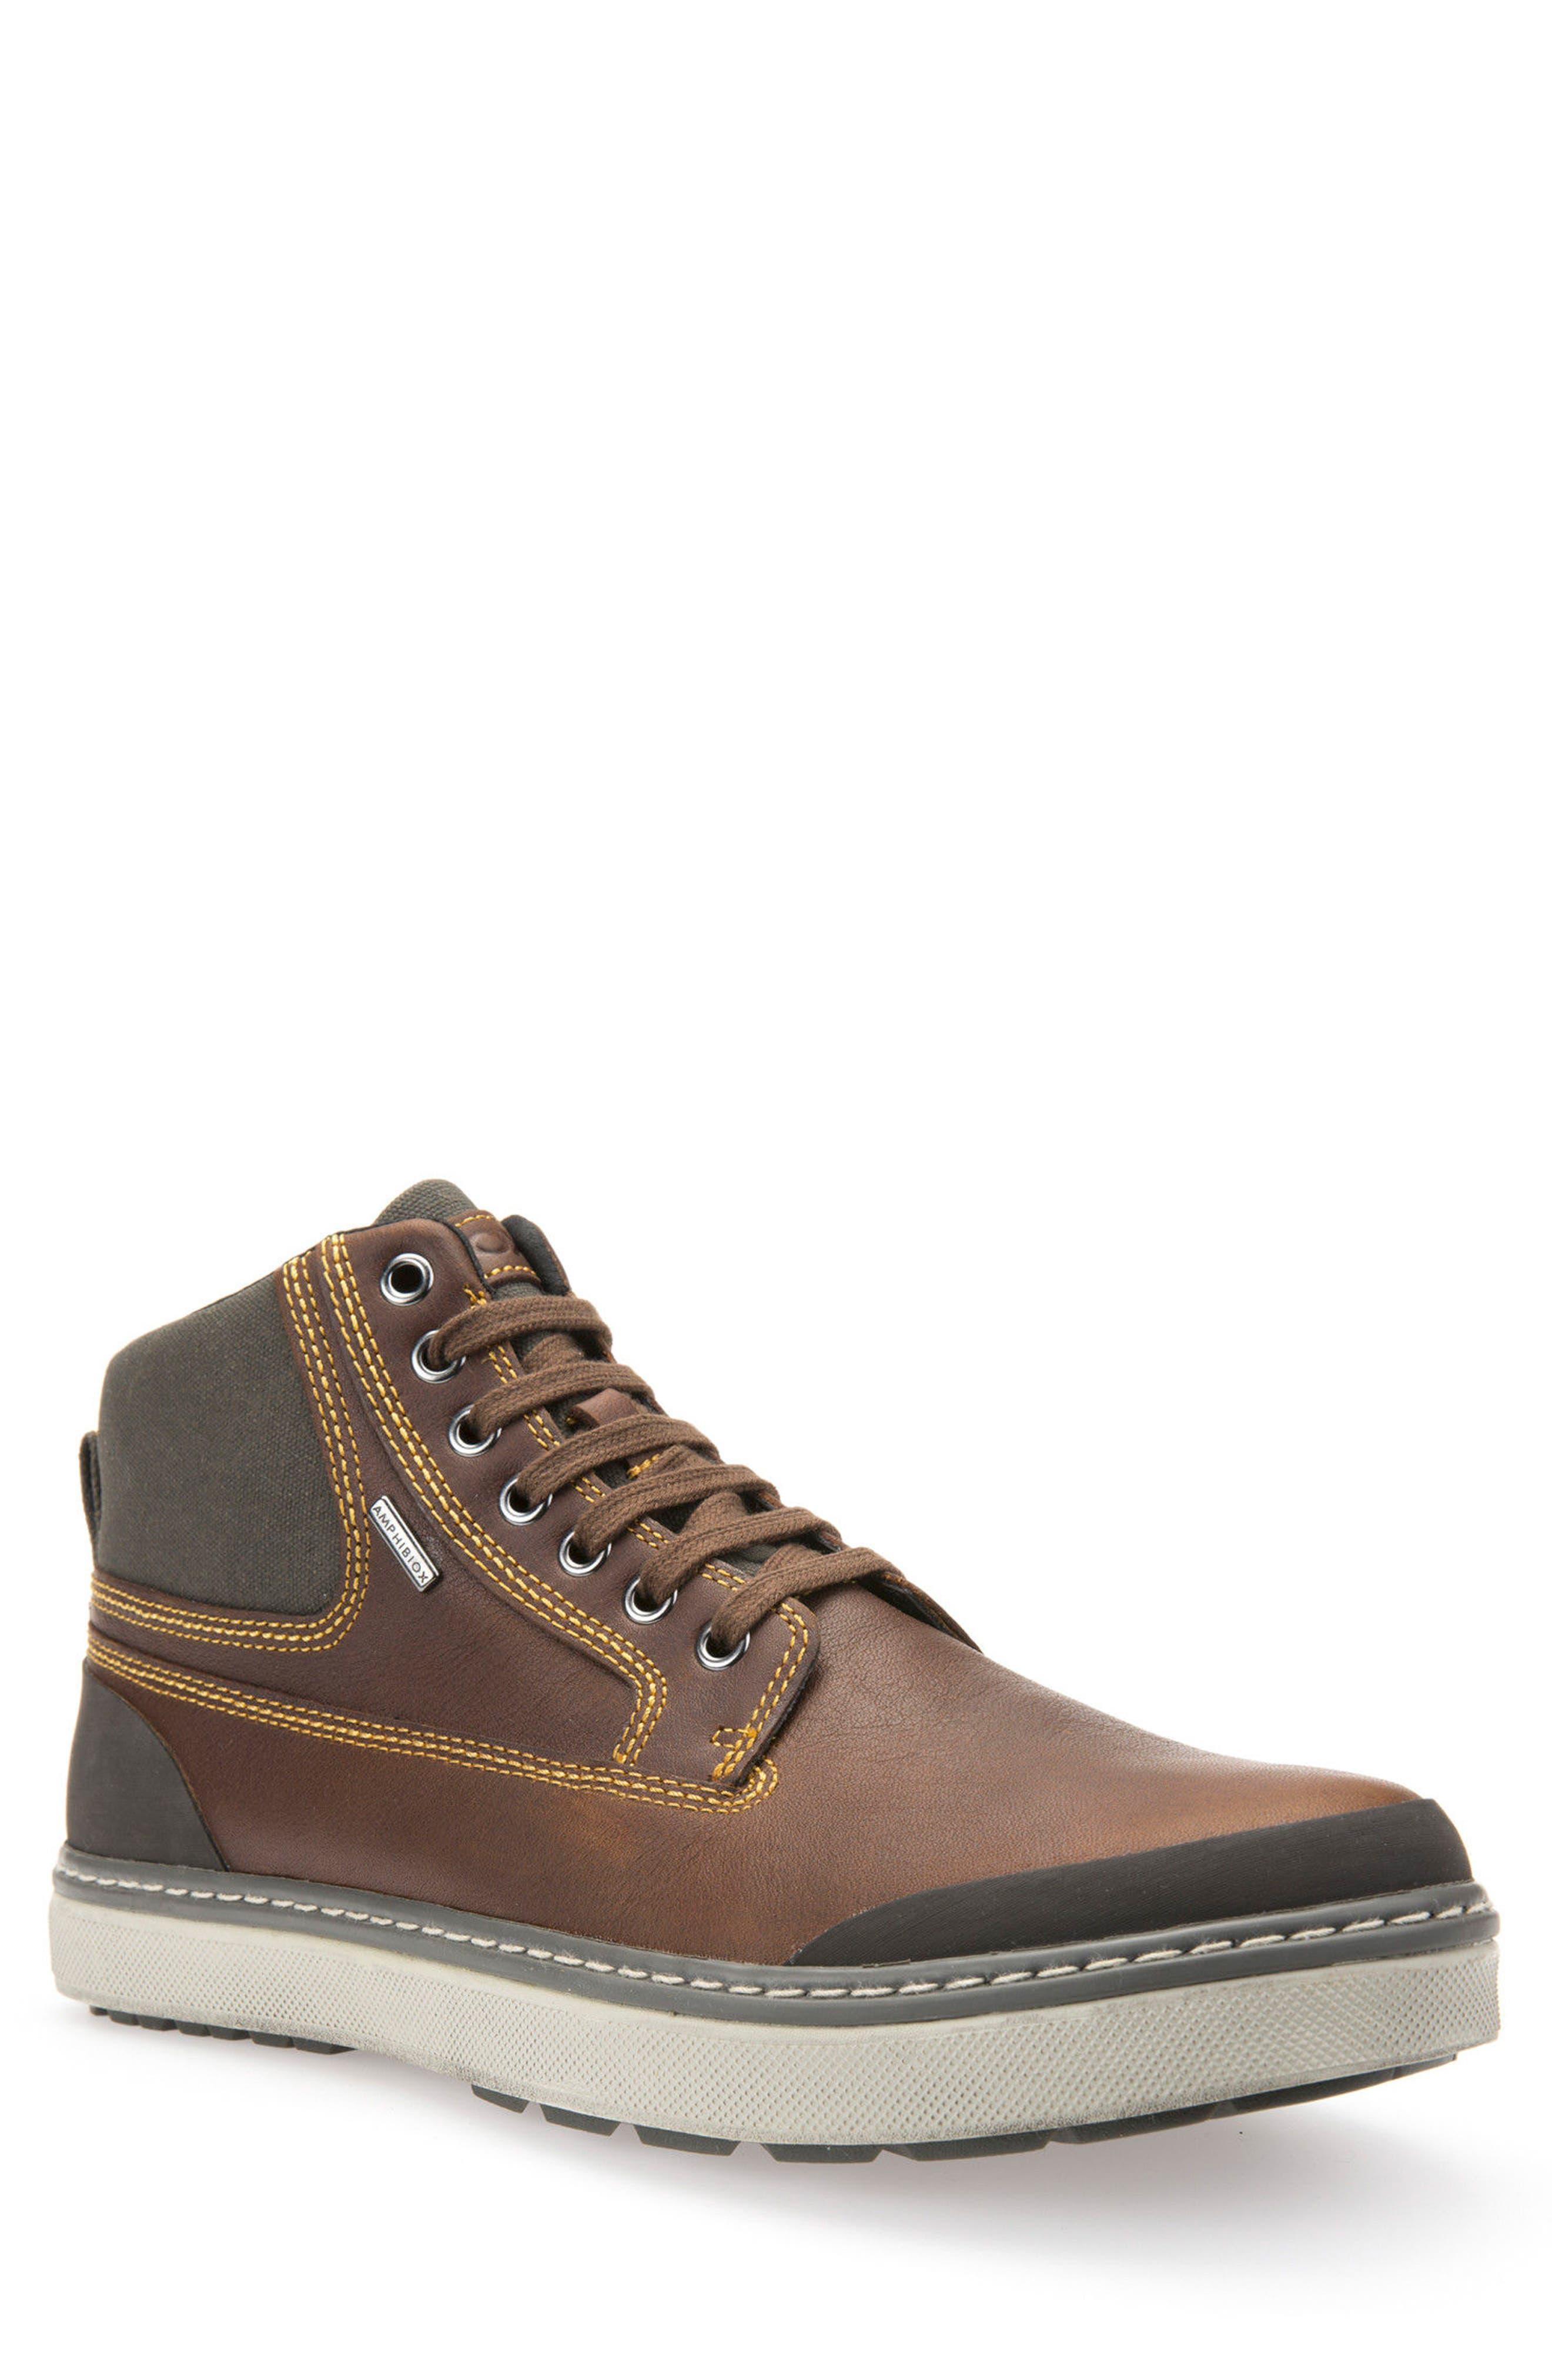 Mattias Amphibiox Waterproof Leather Sneaker,                             Main thumbnail 1, color,                             204